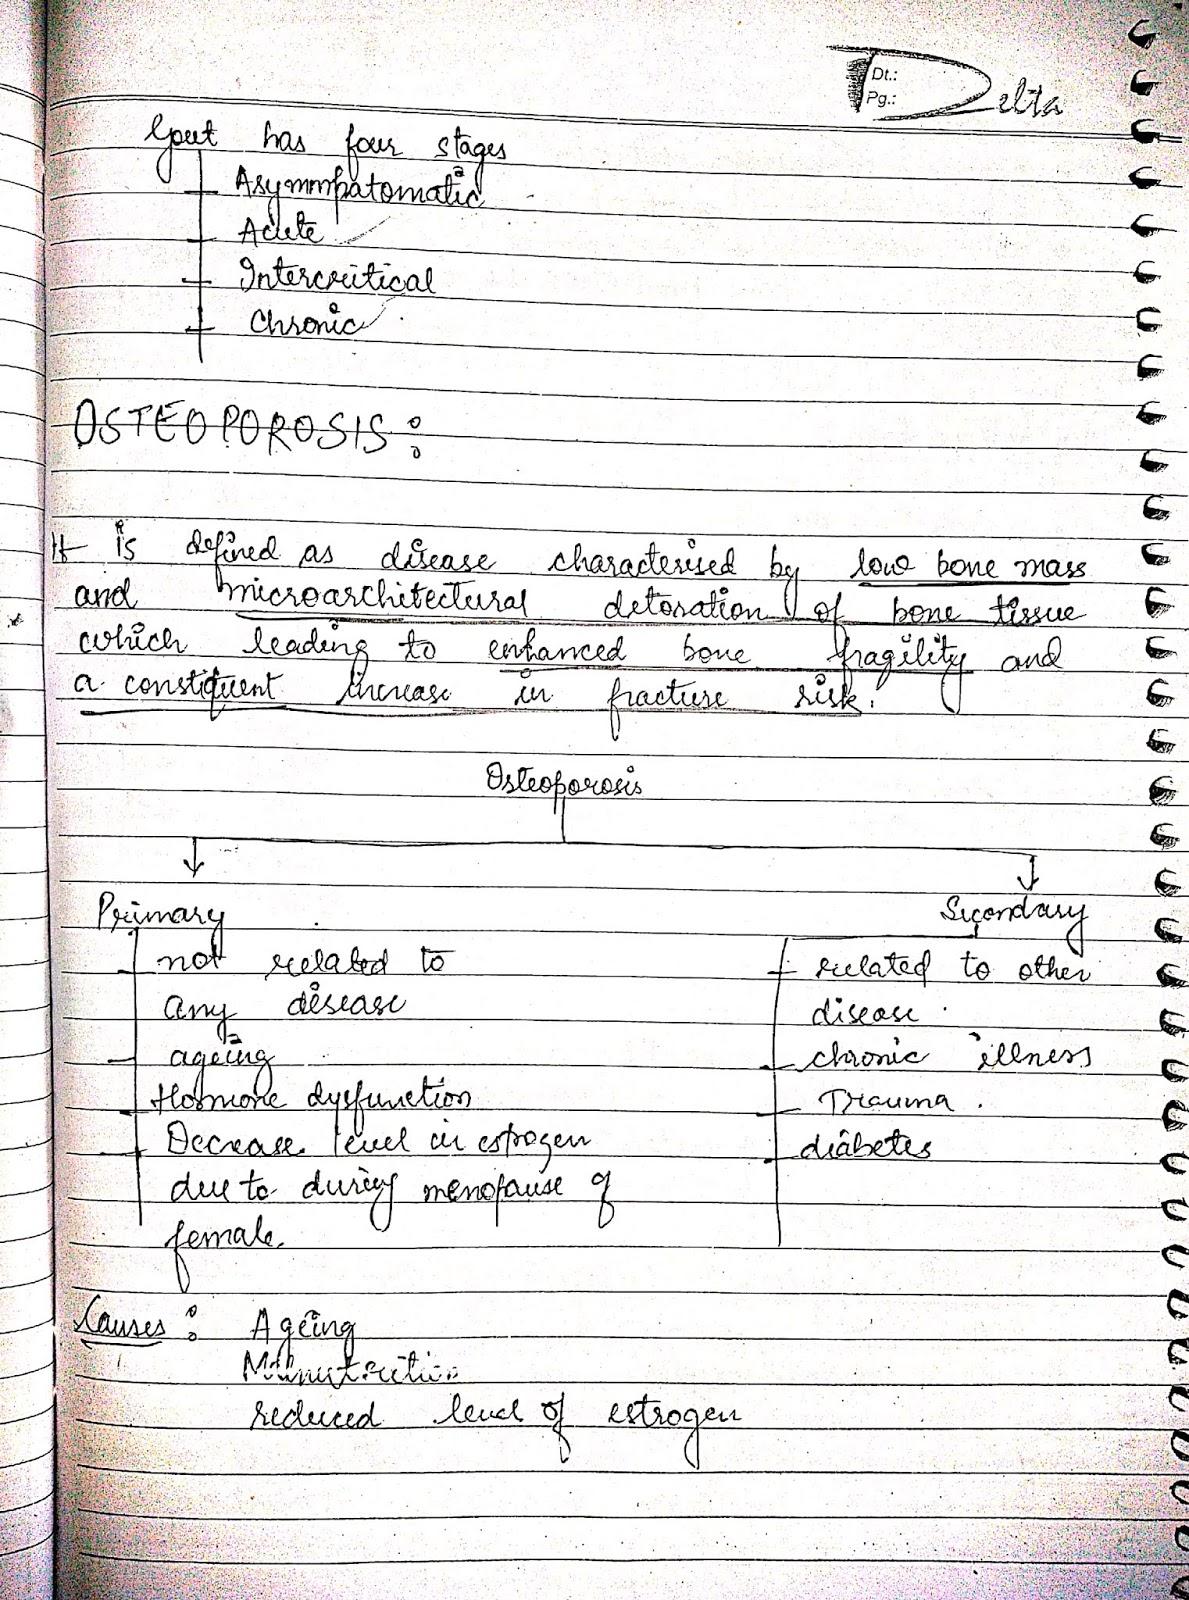 pathophysiology - osteoporosis